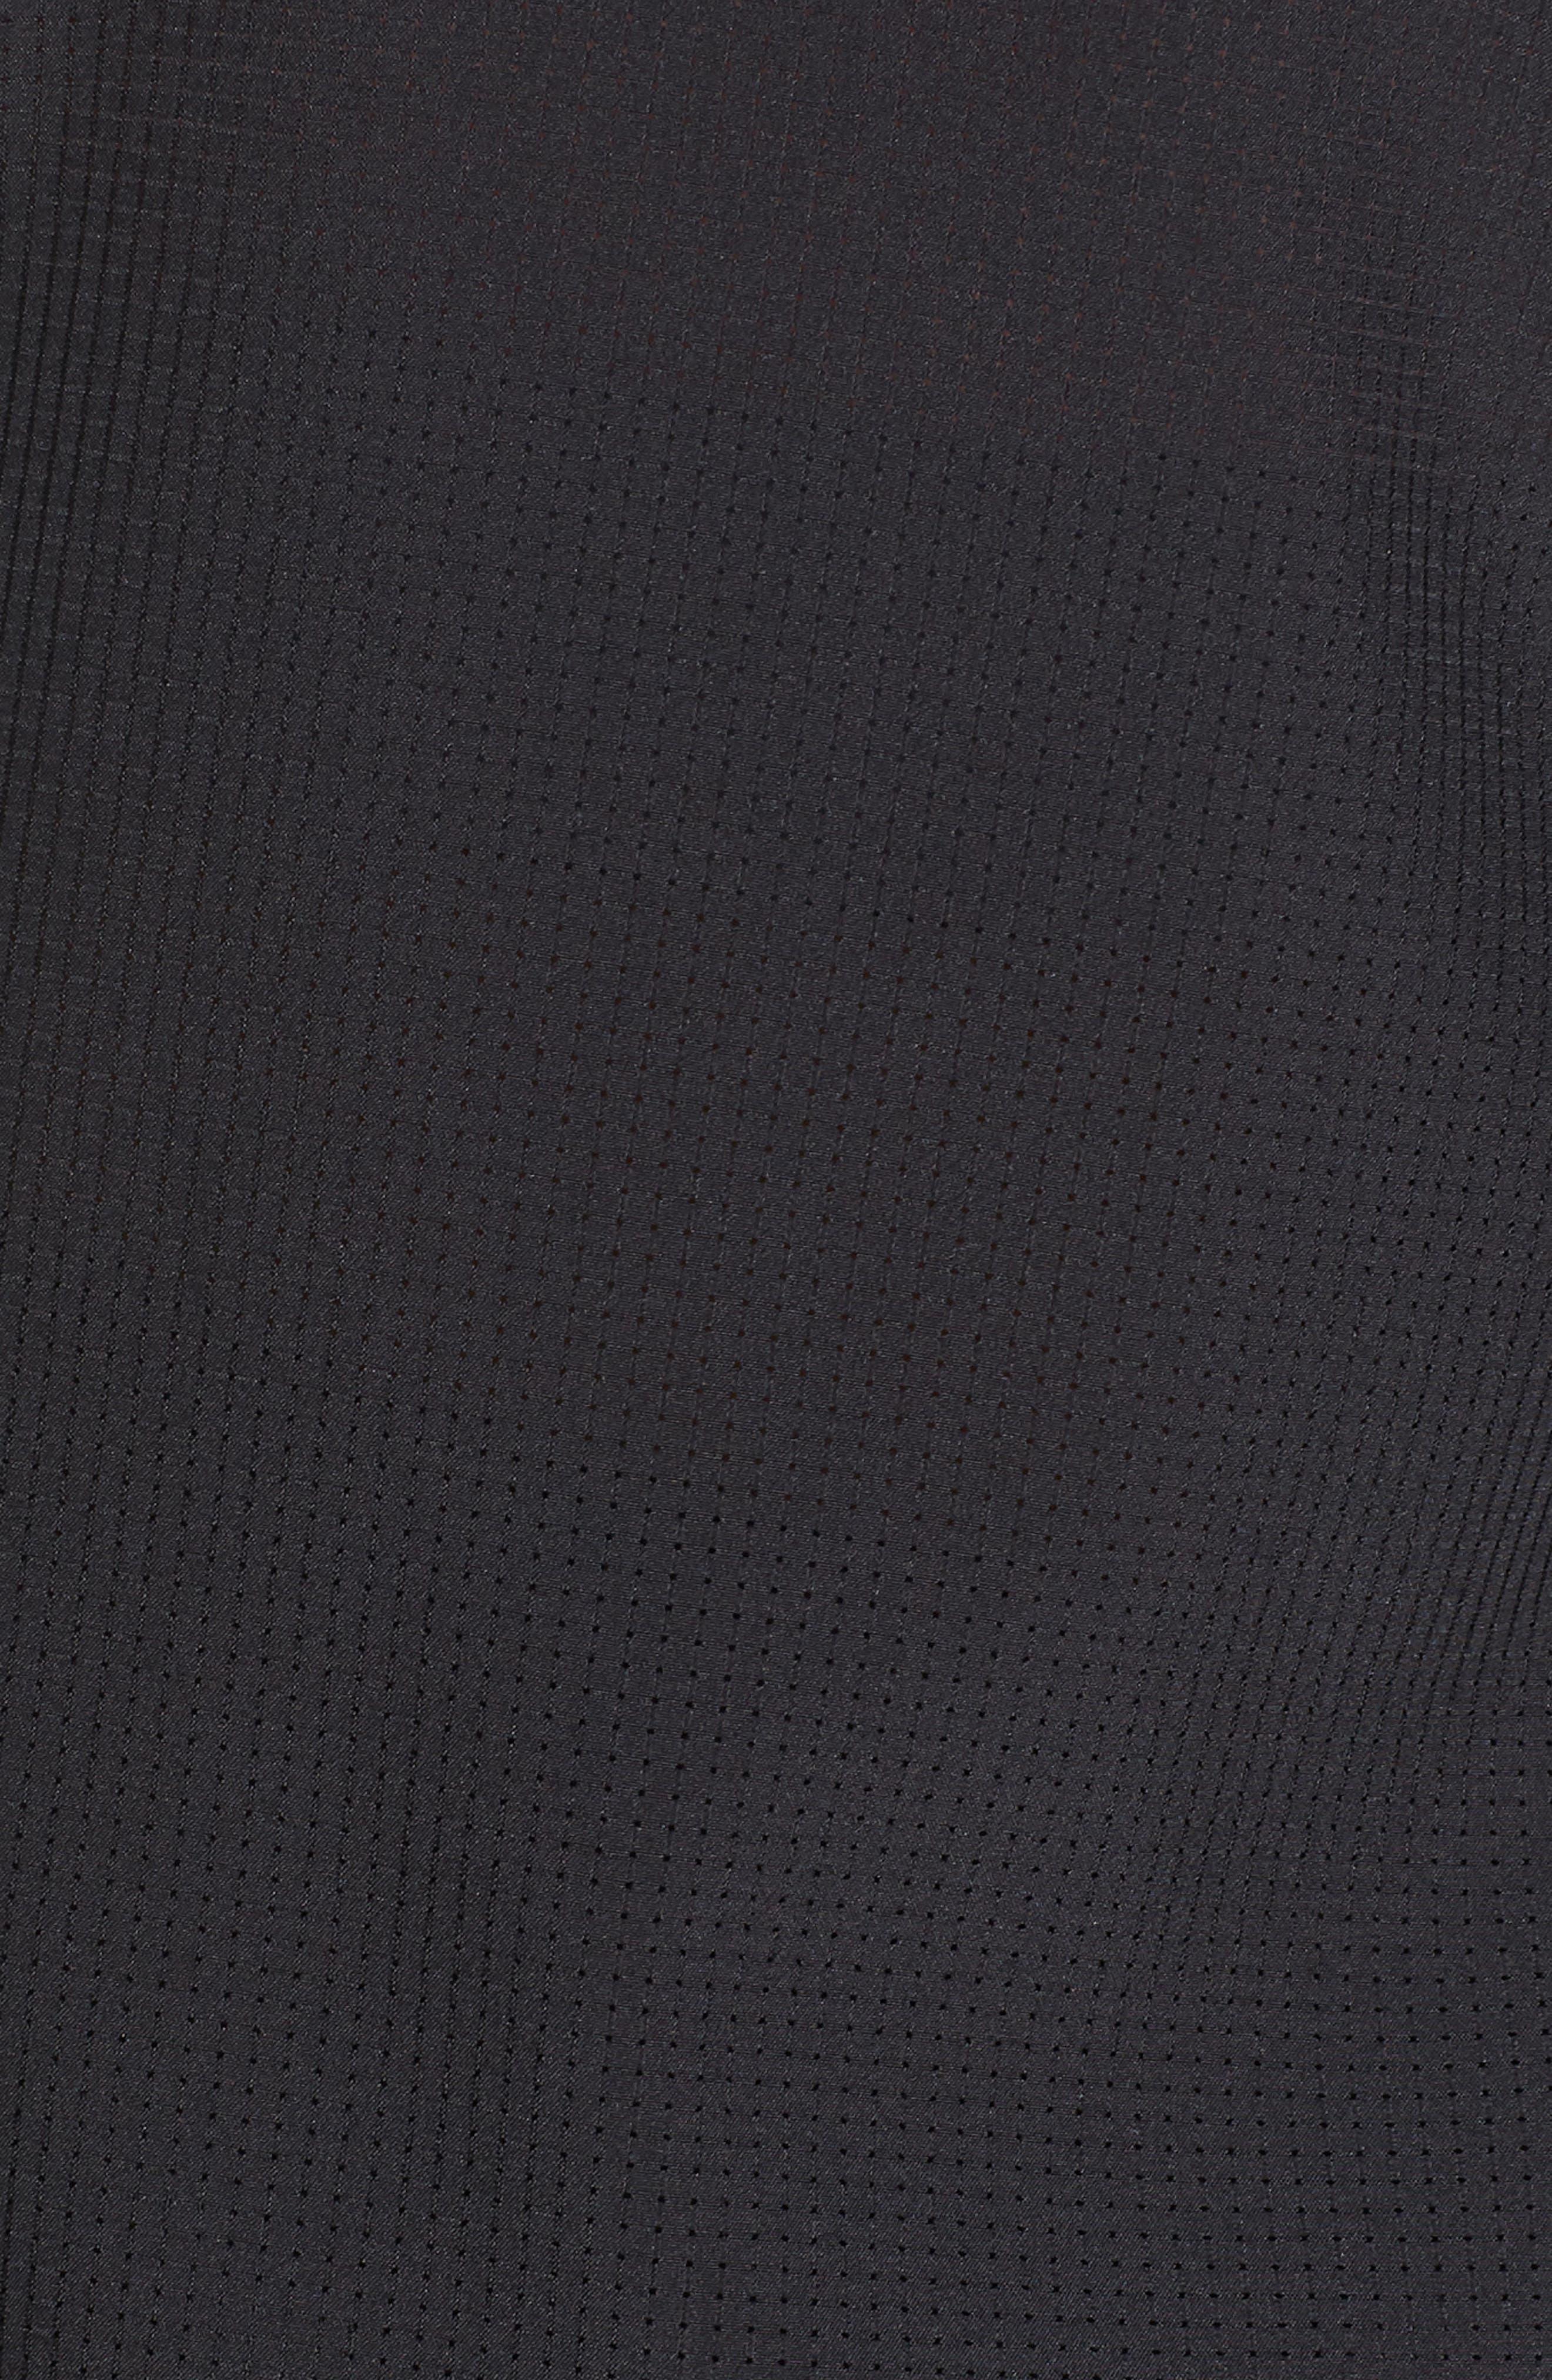 NIKE,                             Flex Bliss Training Jacket,                             Alternate thumbnail 7, color,                             010